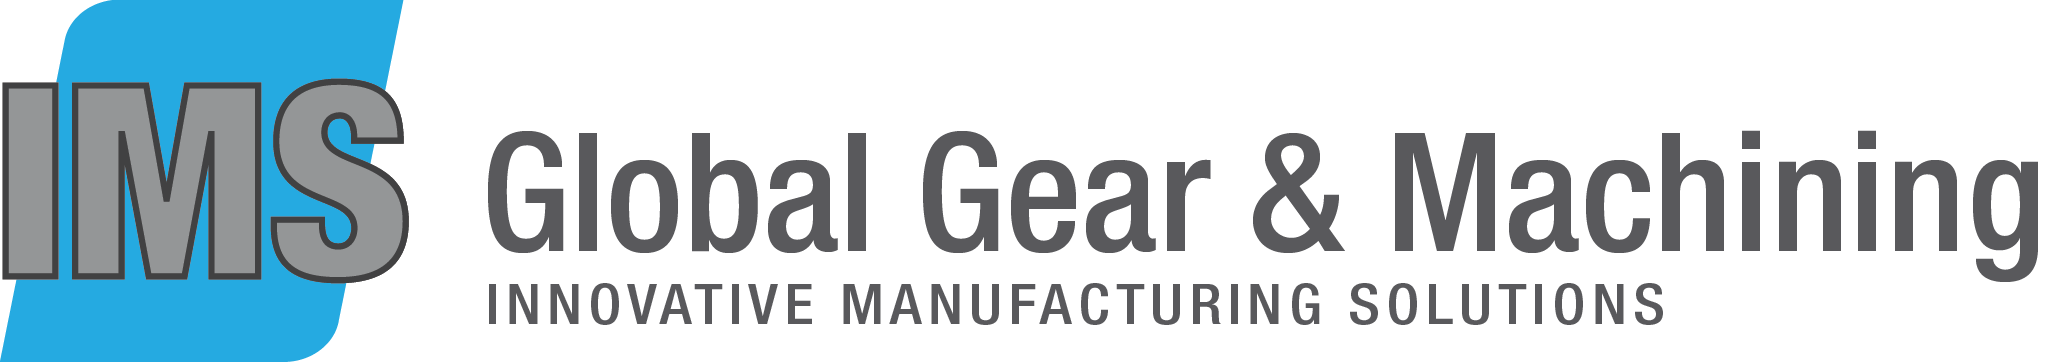 IMS Global Gear & Machining | Downers Grove, IL